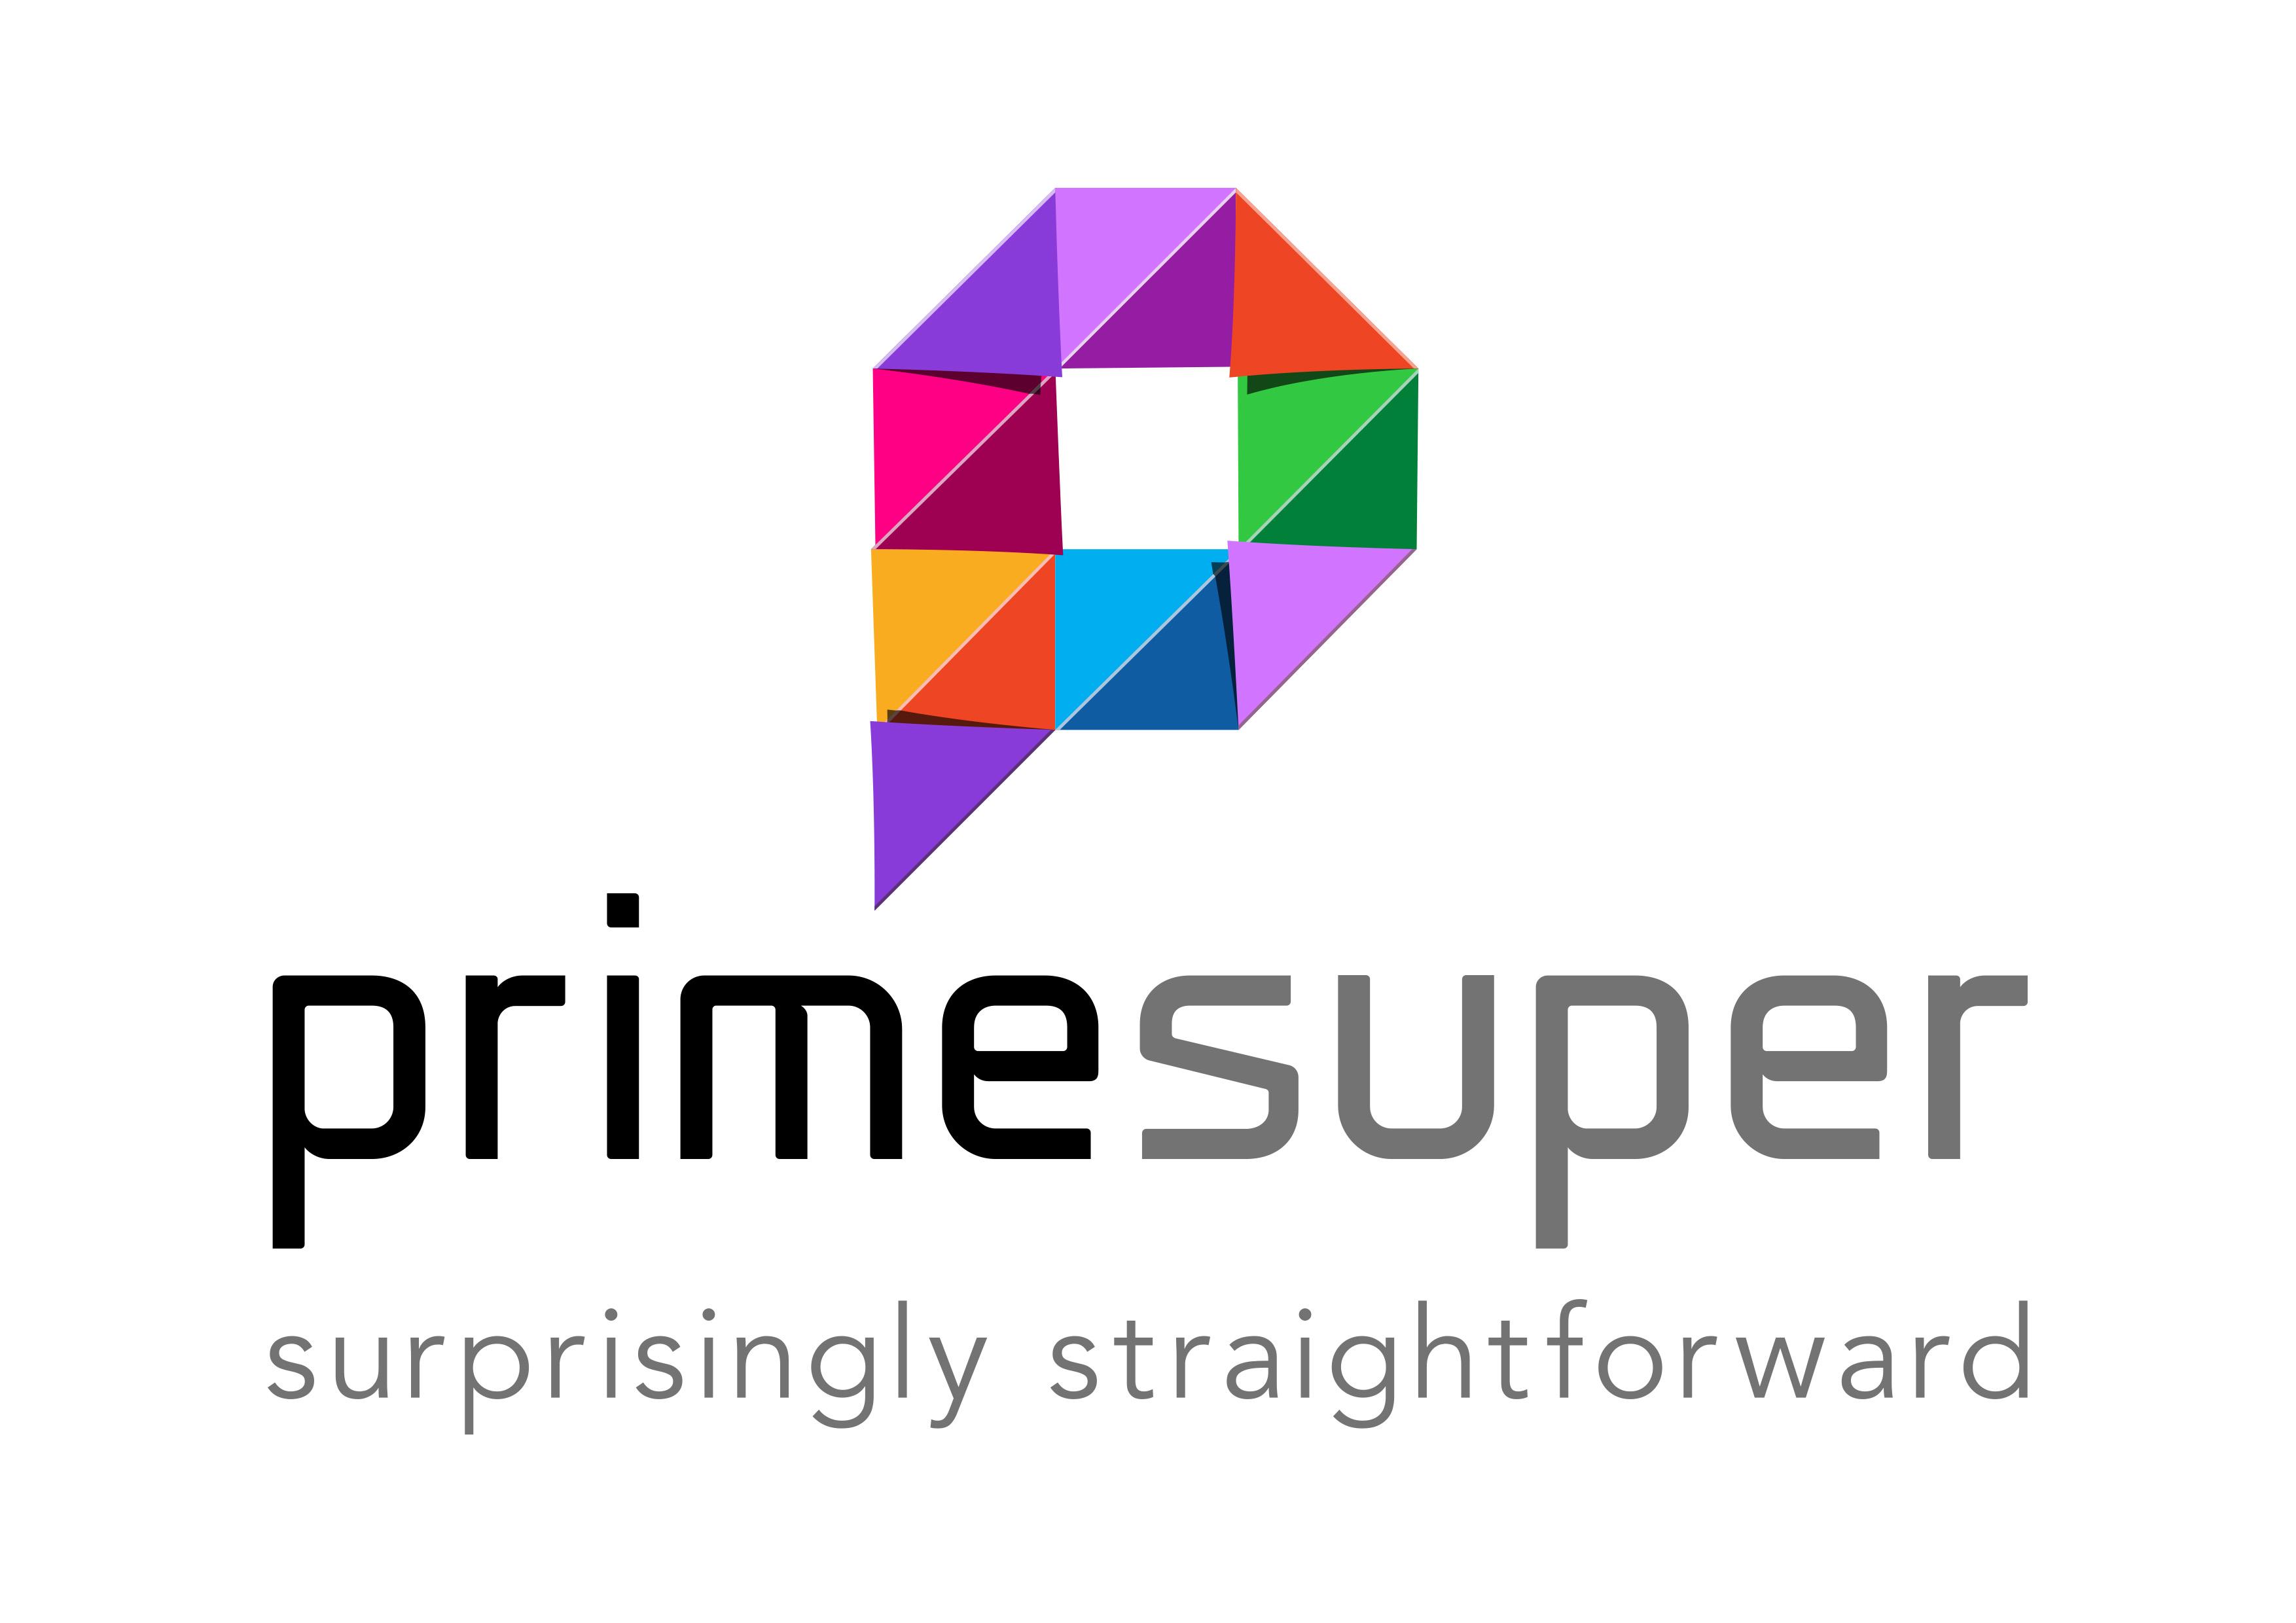 primesuper-logo-tagline-rgb (2)